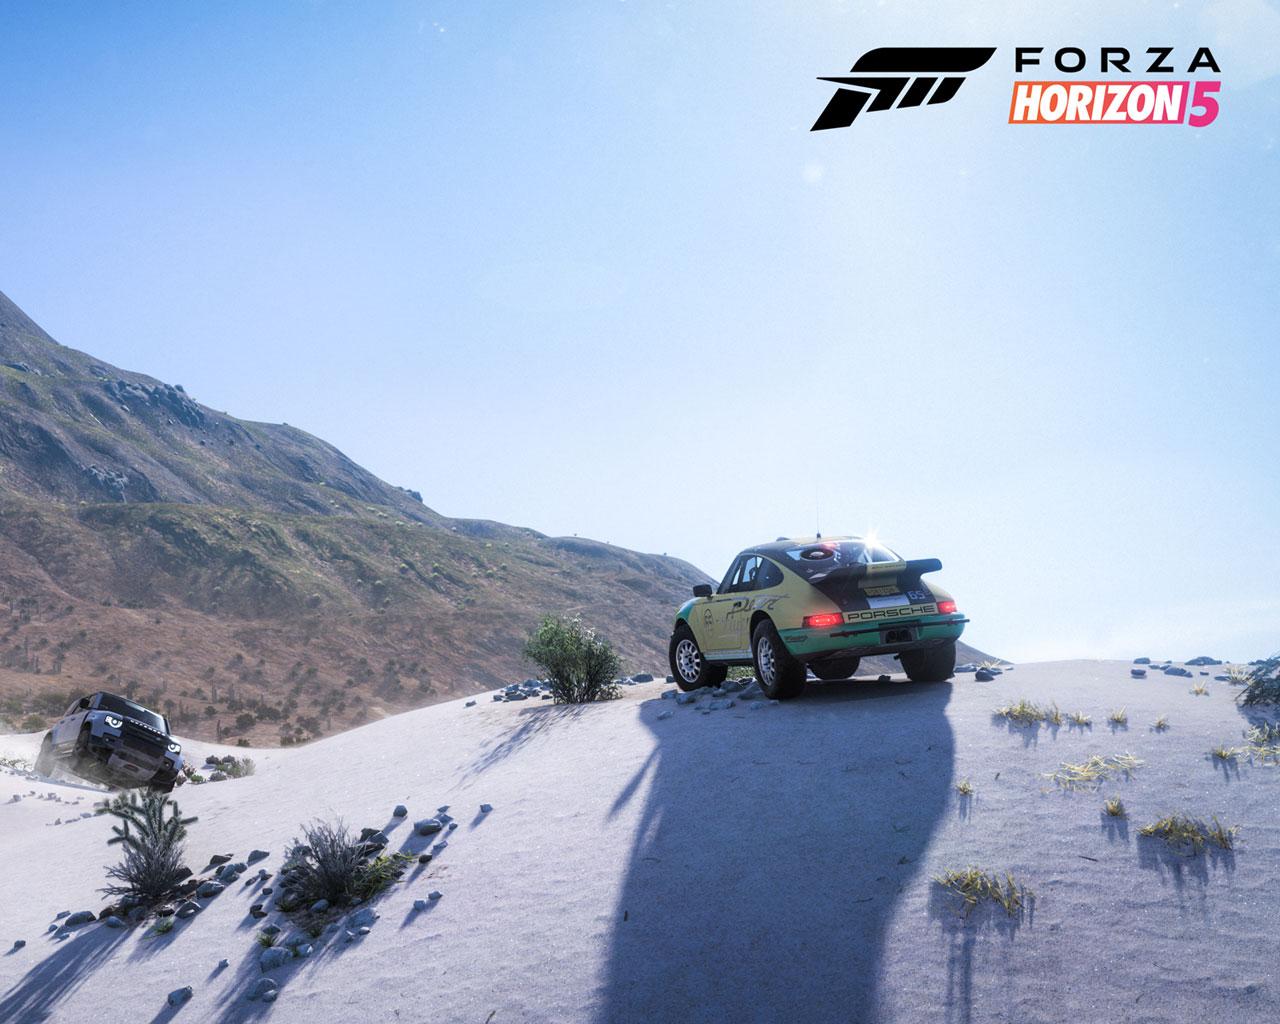 Free Forza Horizon 5 Wallpaper in 1280x1024